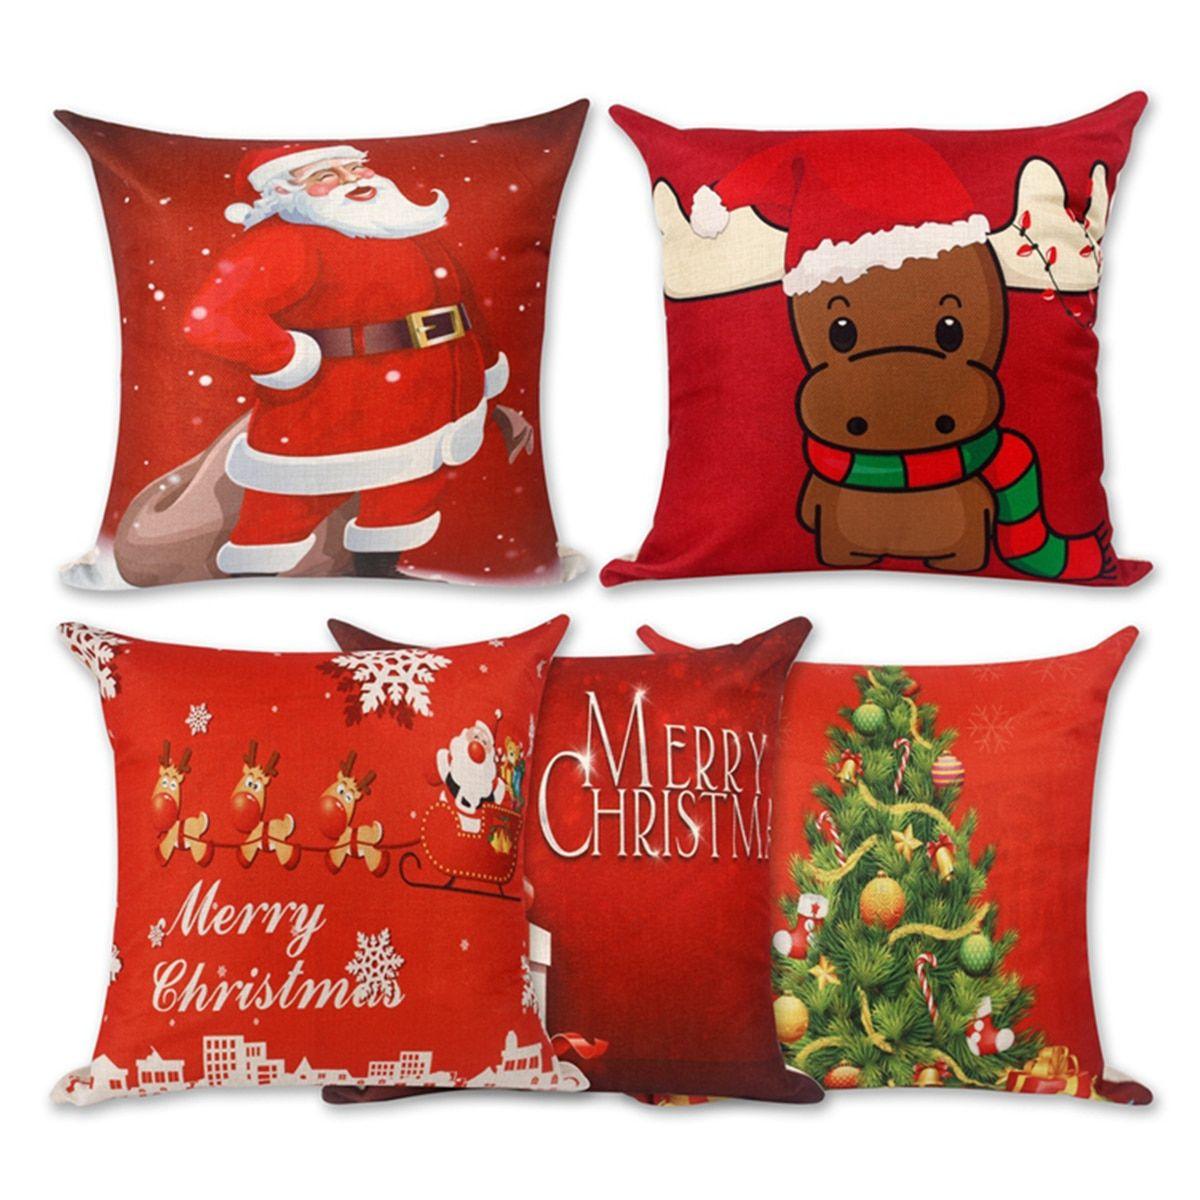 Christmas Decoration Cushion Cover Christmas Pillowcases Xmas Pillows Christmas Pillow Covers